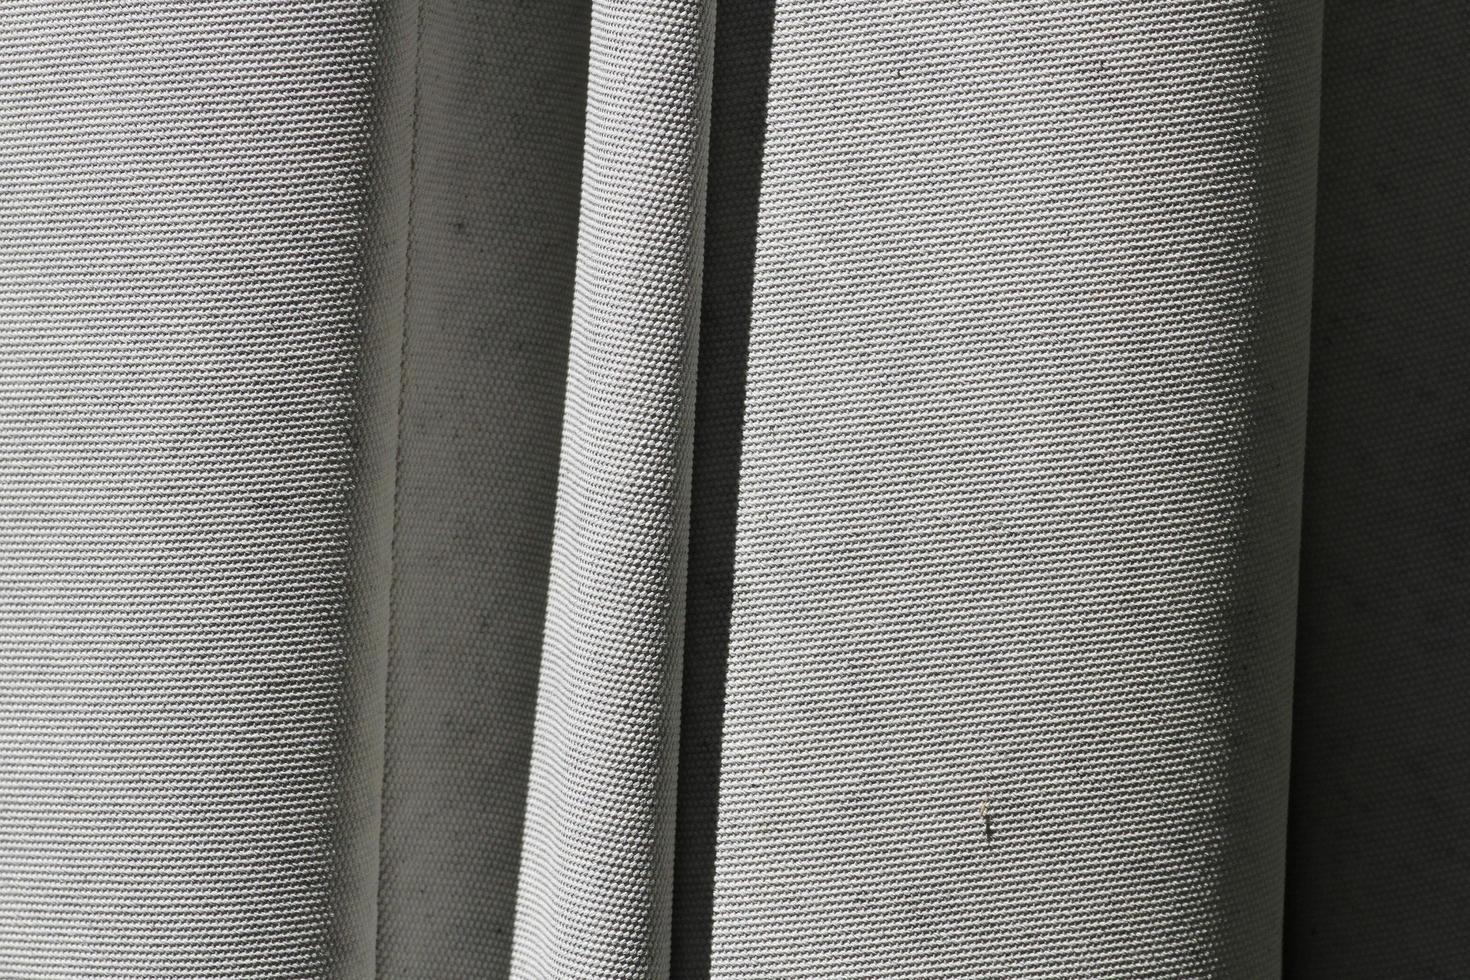 rynkad duk textur bakgrund foto